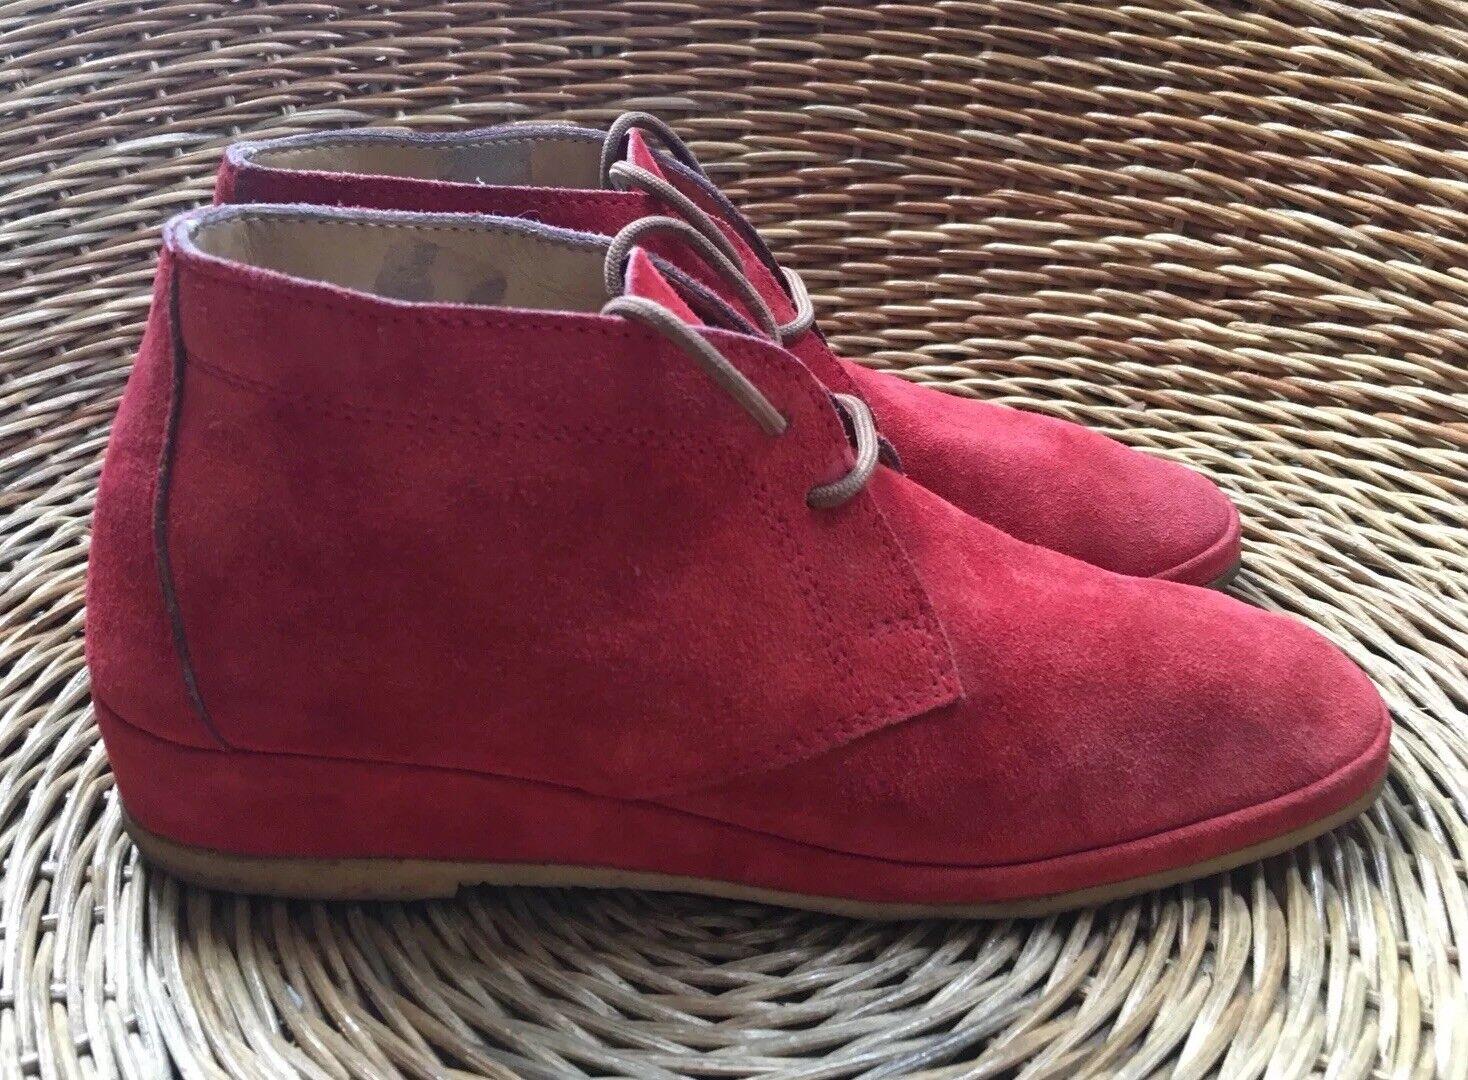 A Jones & Sons Women's Red Suede Hi-Top Desert Ankle Boots B VGC